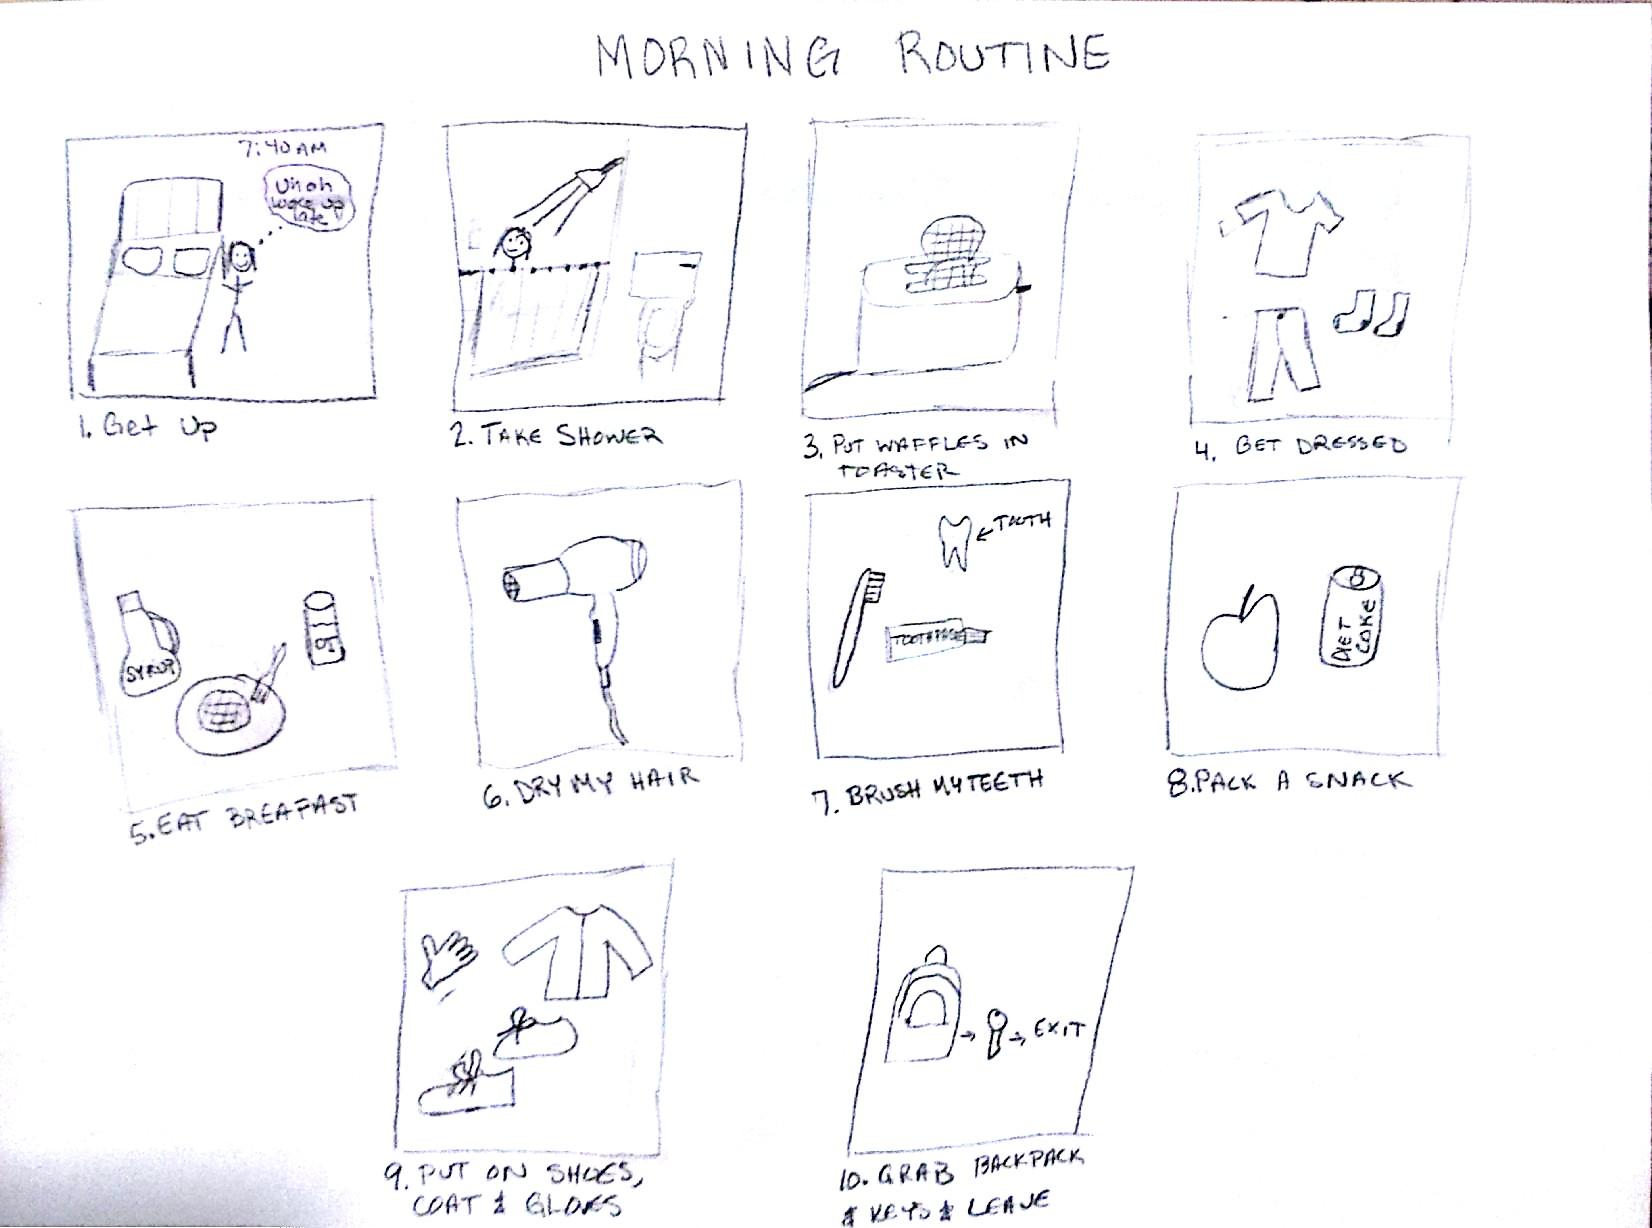 Morning Routine Storyboard